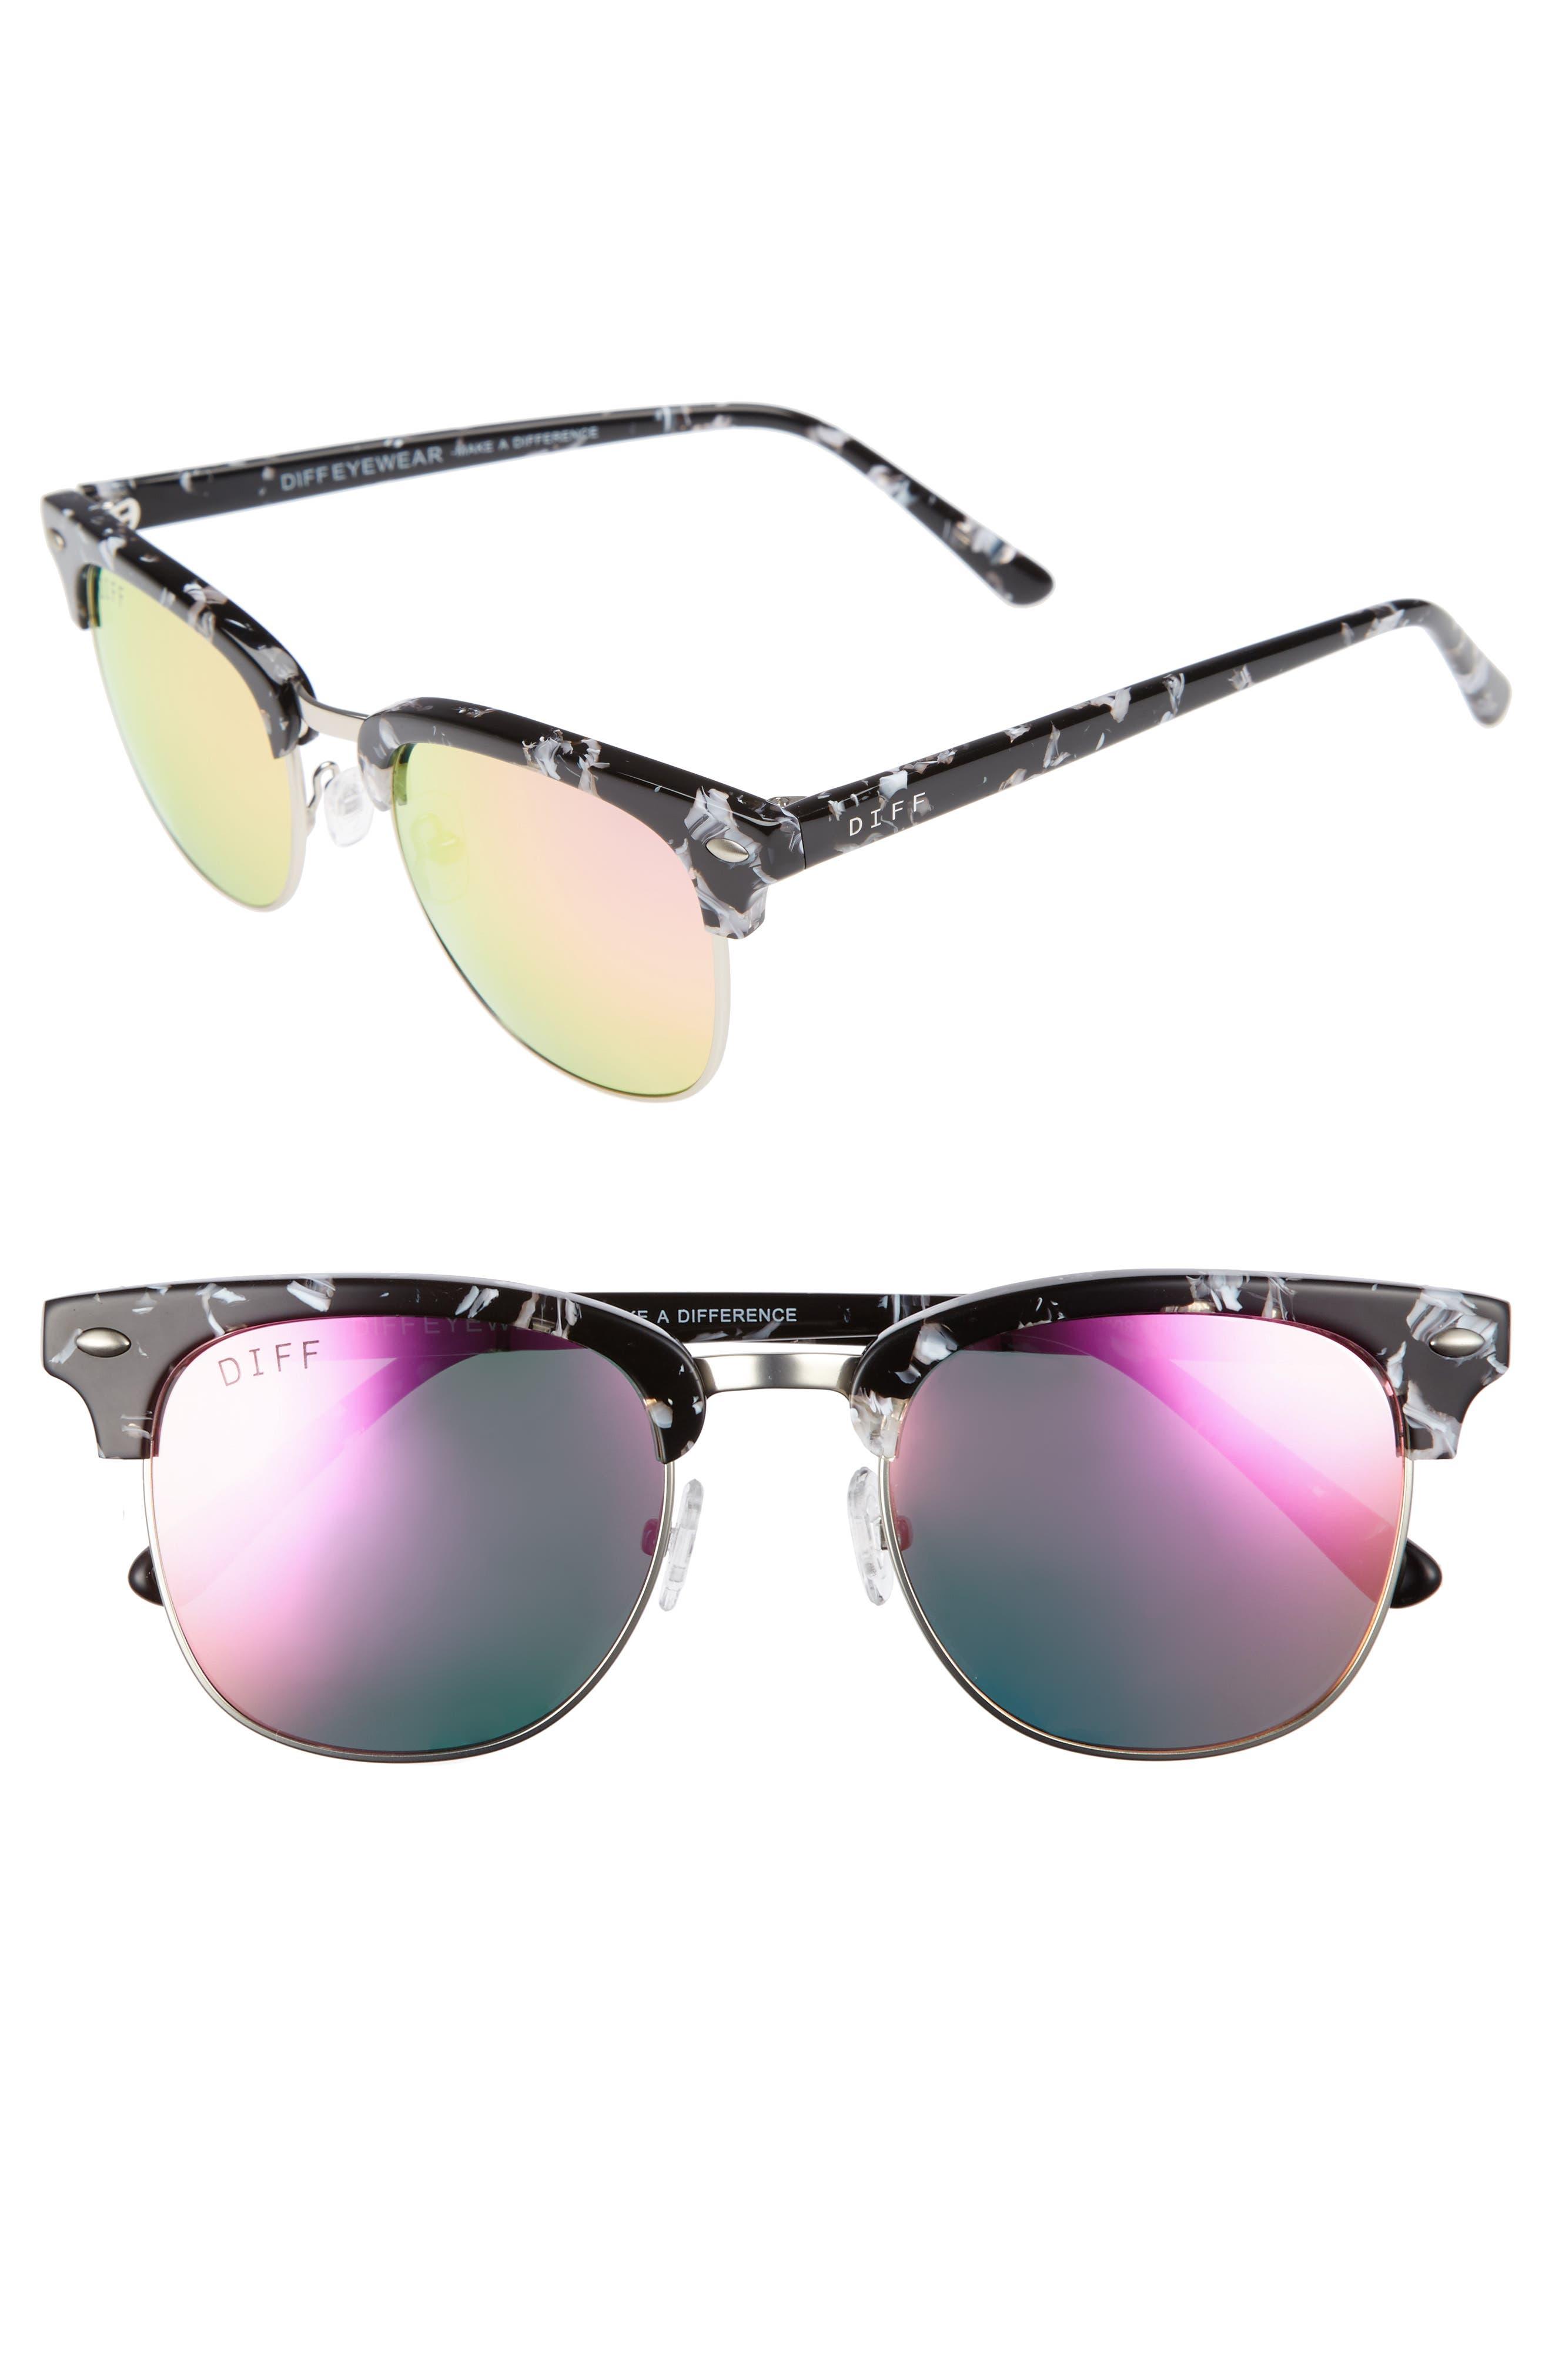 Alternate Image 1 Selected - DIFF Barry 51mm Polarized Retro Sunglasses